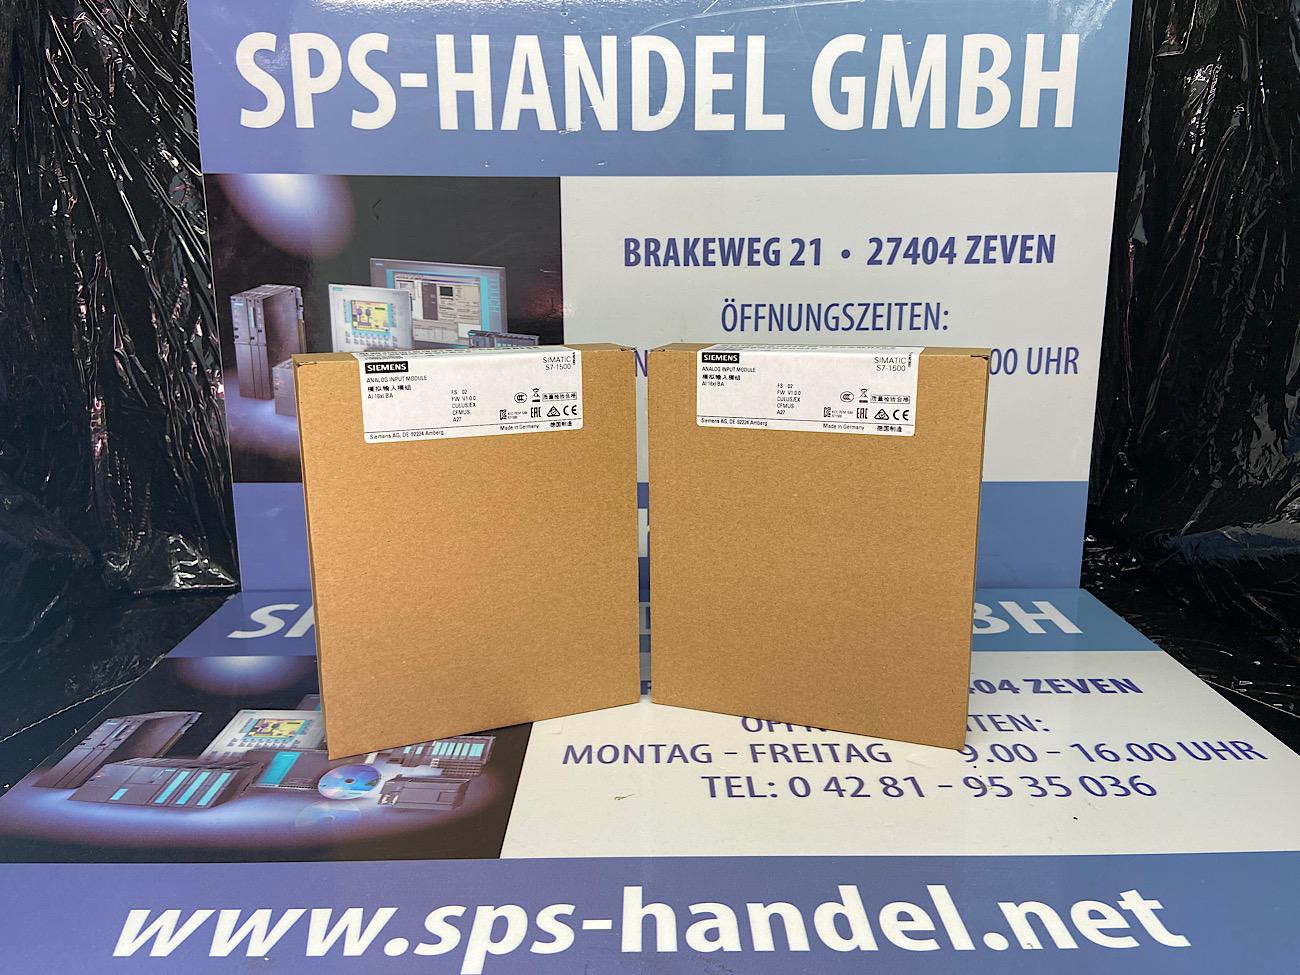 6ES7531-7NF00-0AB0   S7-1500   AI 8xU/I HF   Neu Siegel 26%